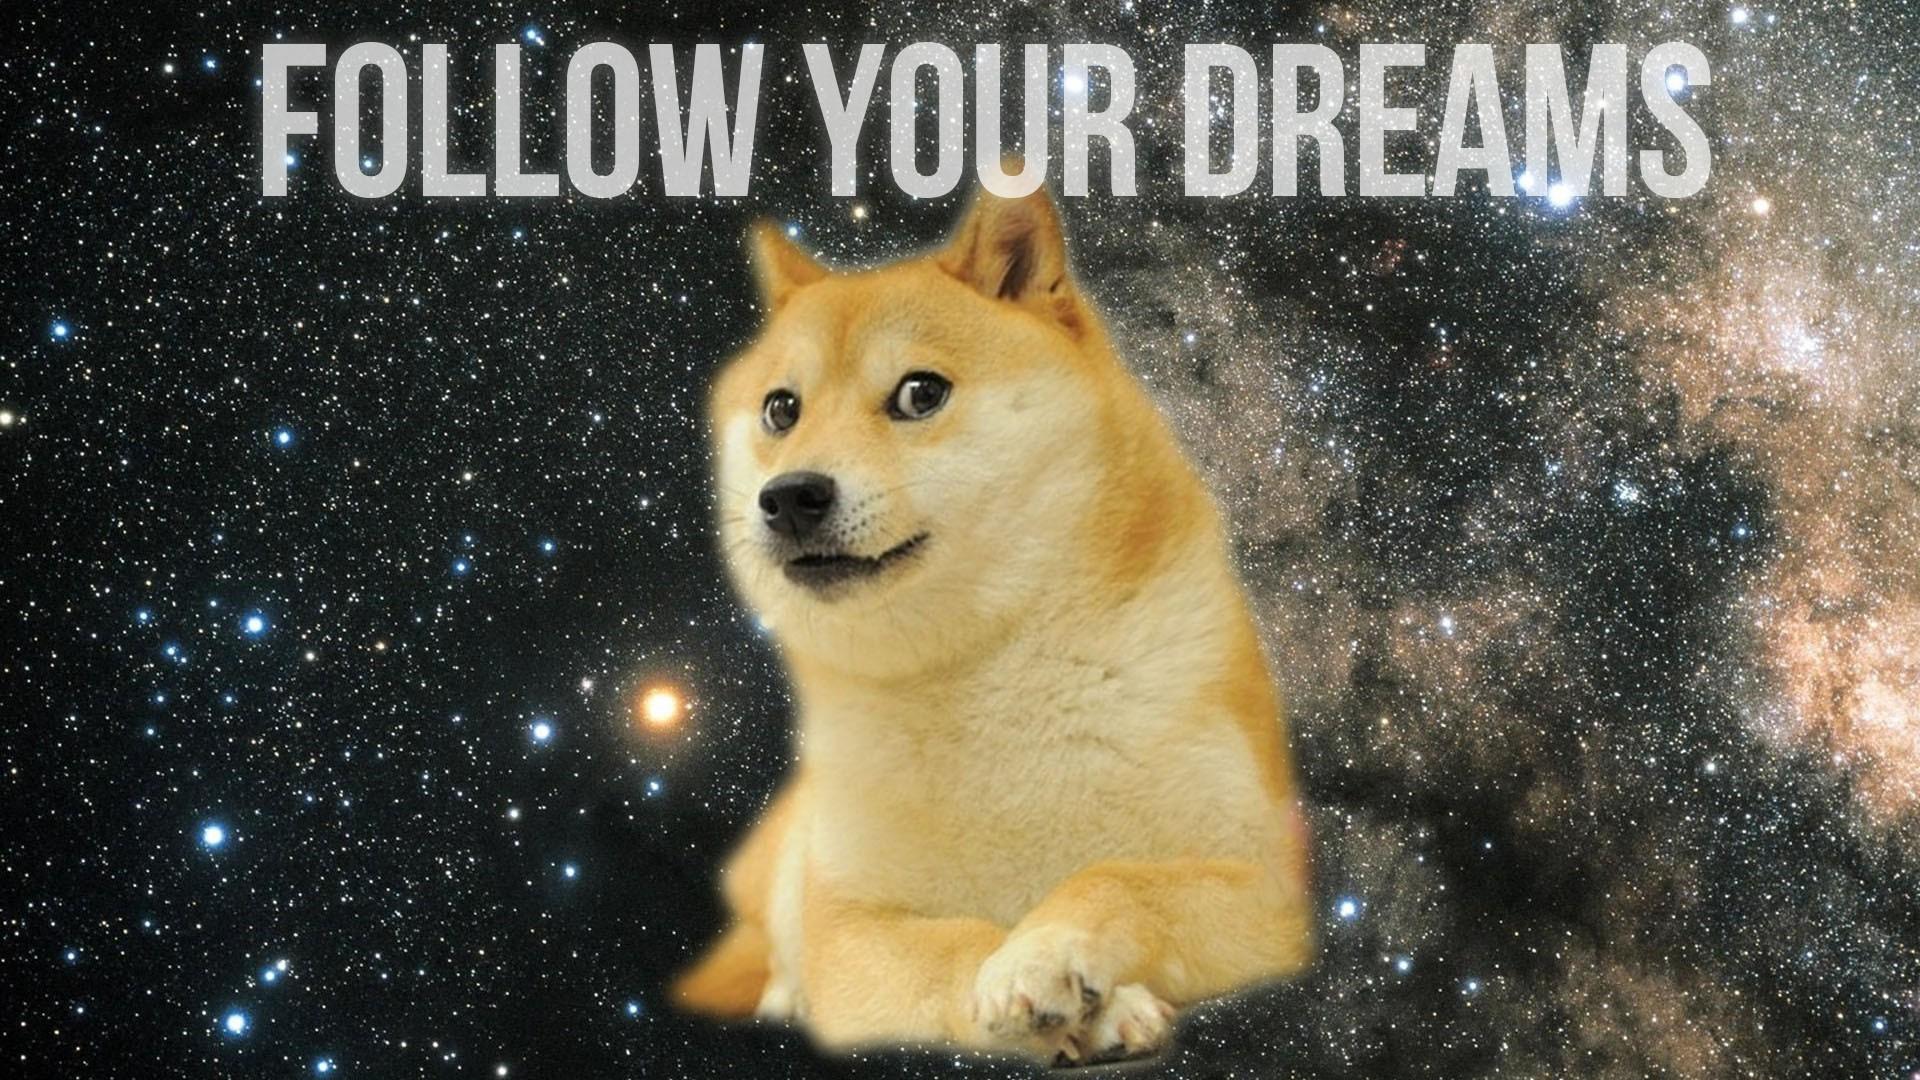 General 1920x1080 doge inspirational animals motivational memes